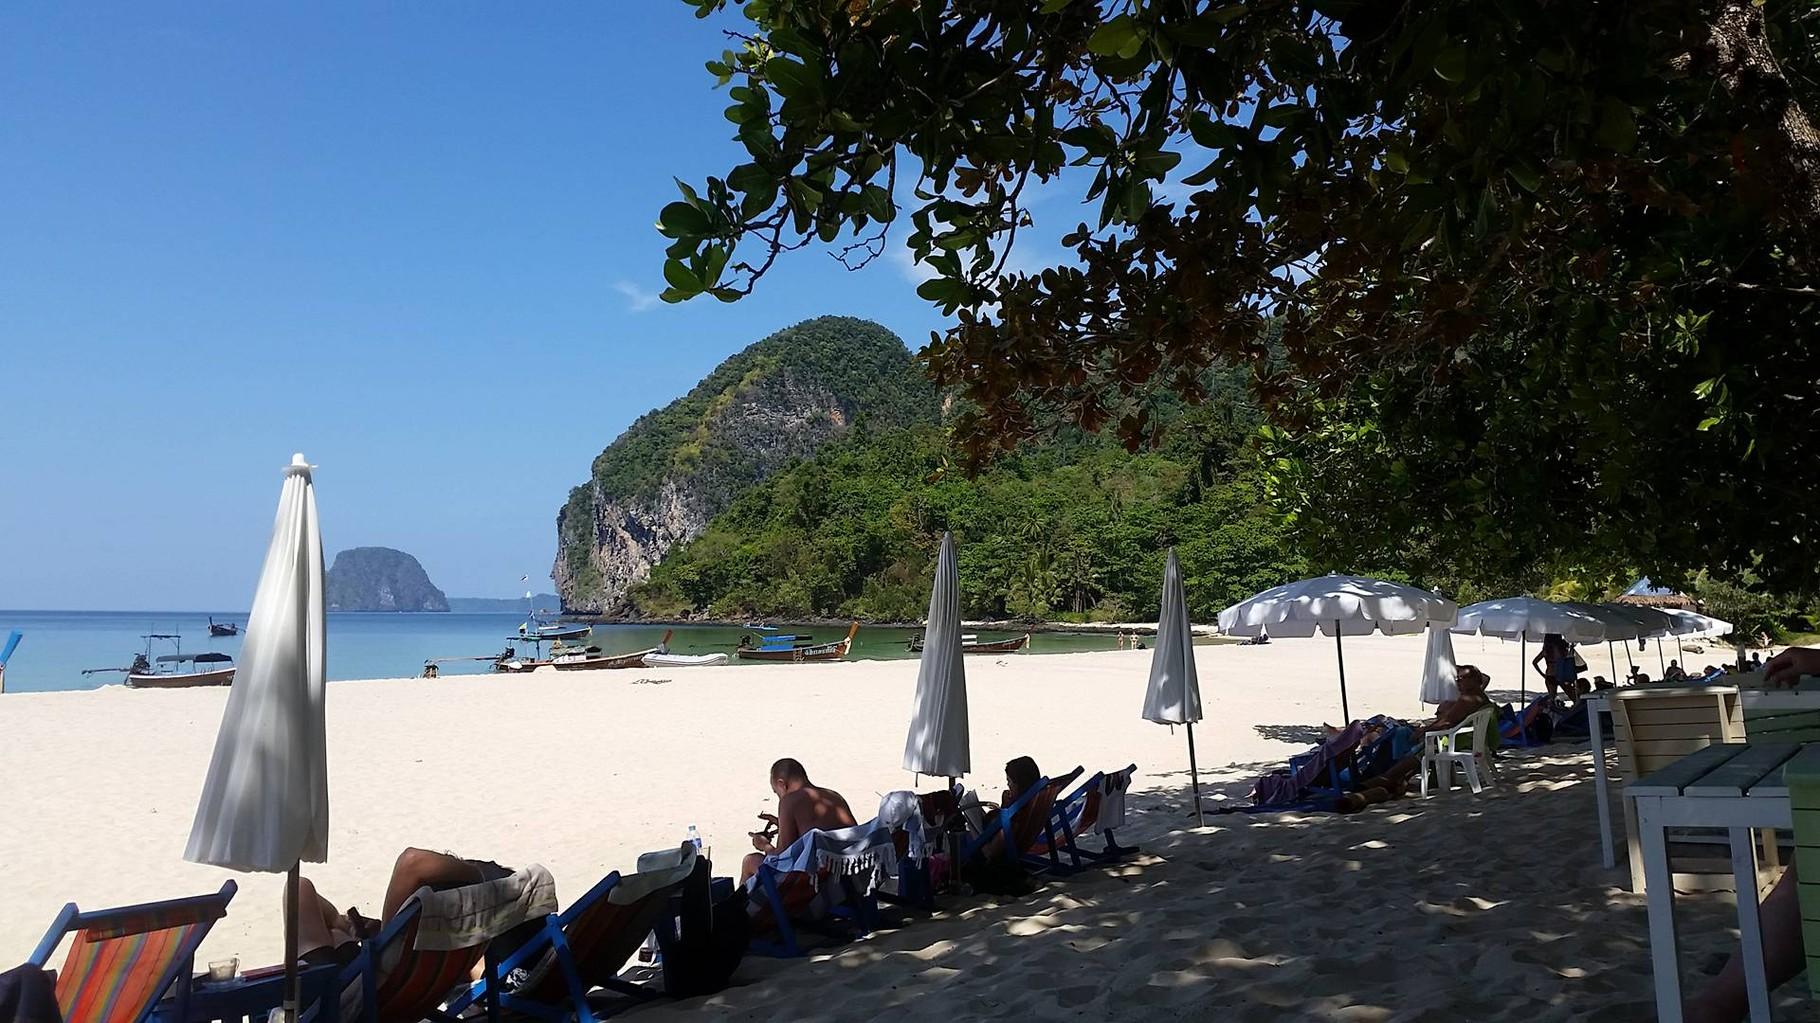 Die Charly Beach auf Koh Mook